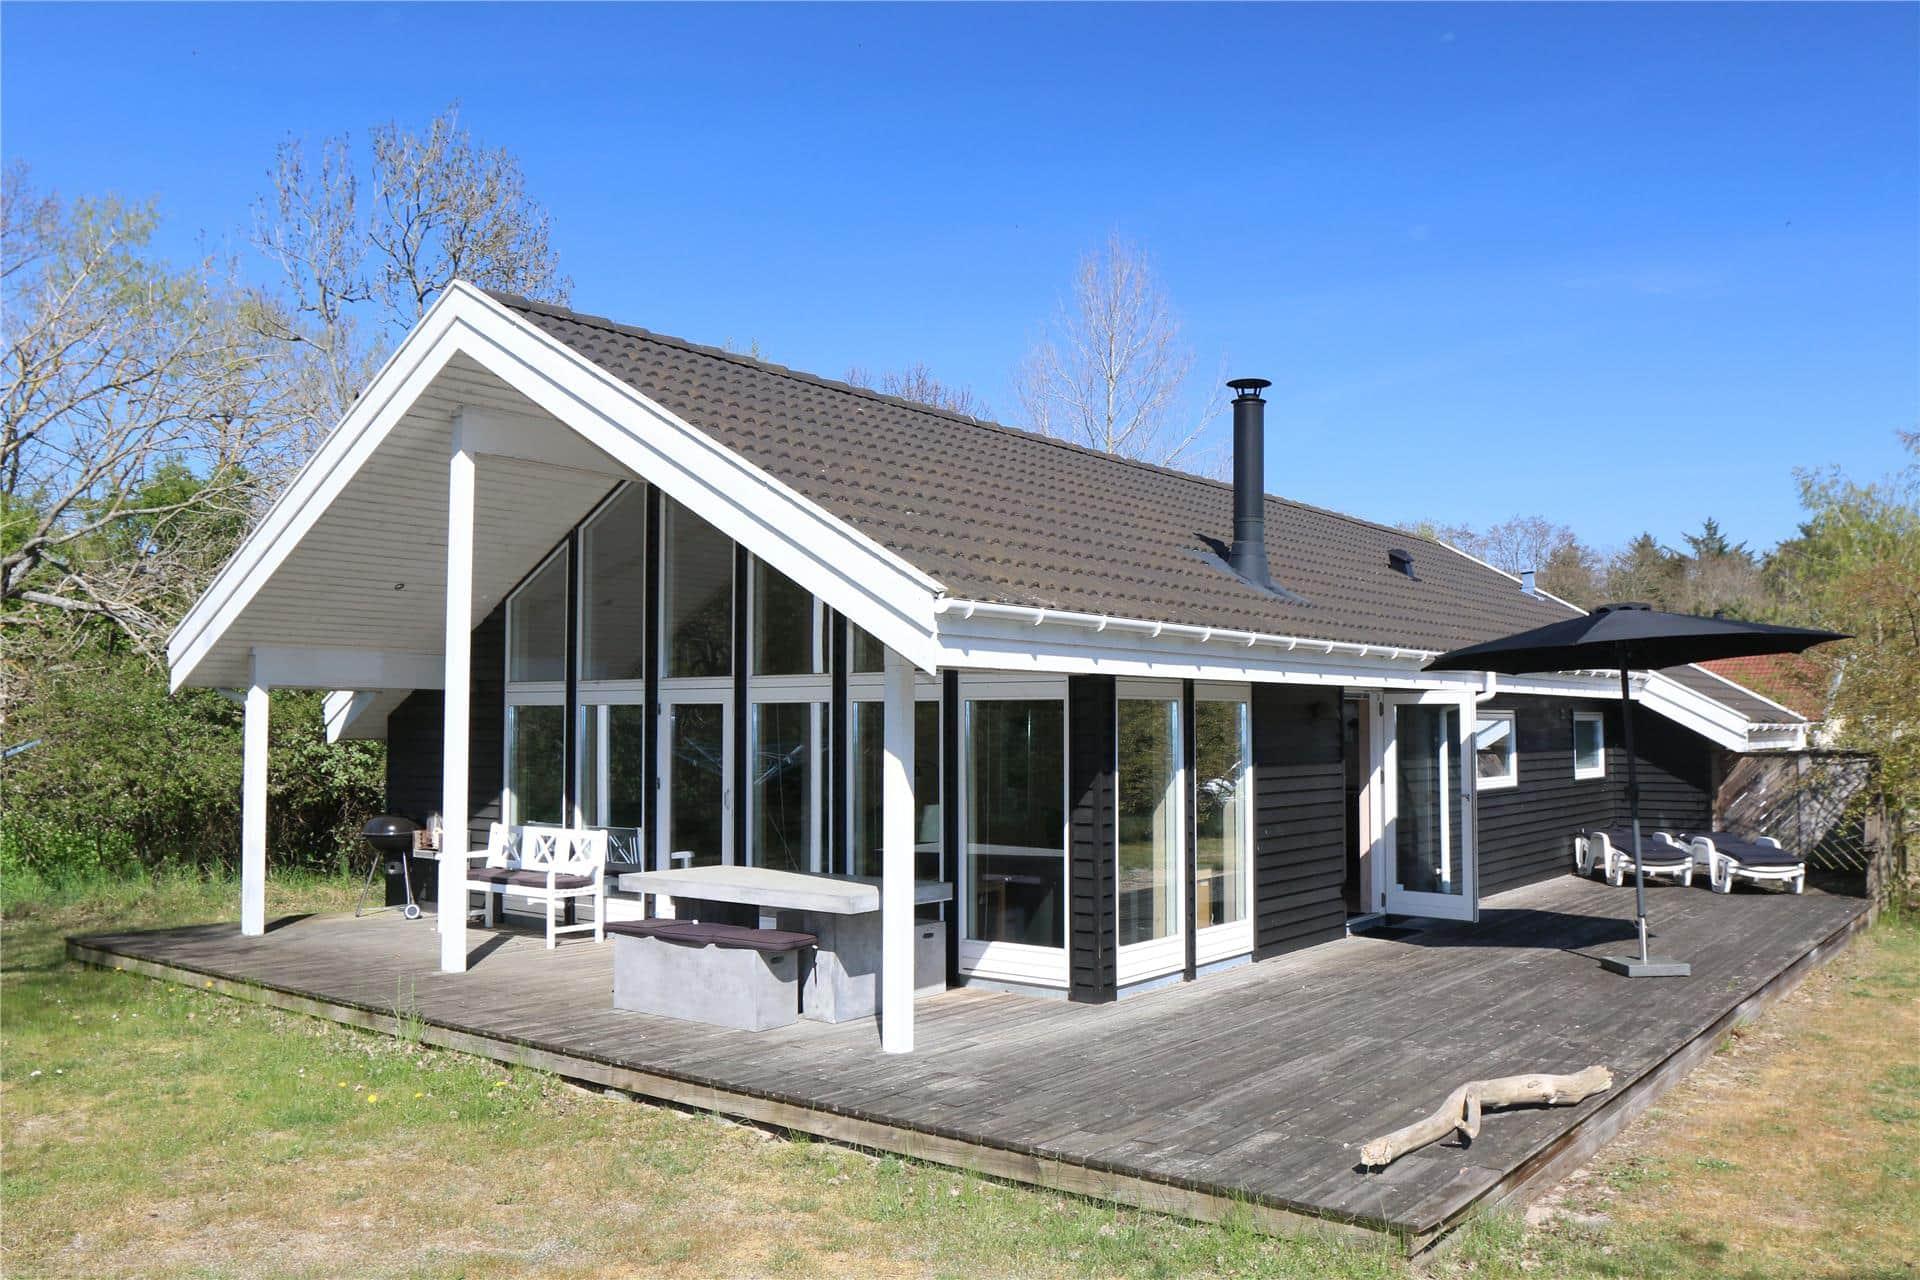 Billede 1-10 Sommerhus 1441, Strandparken 14, DK - 3720 Aakirkeby